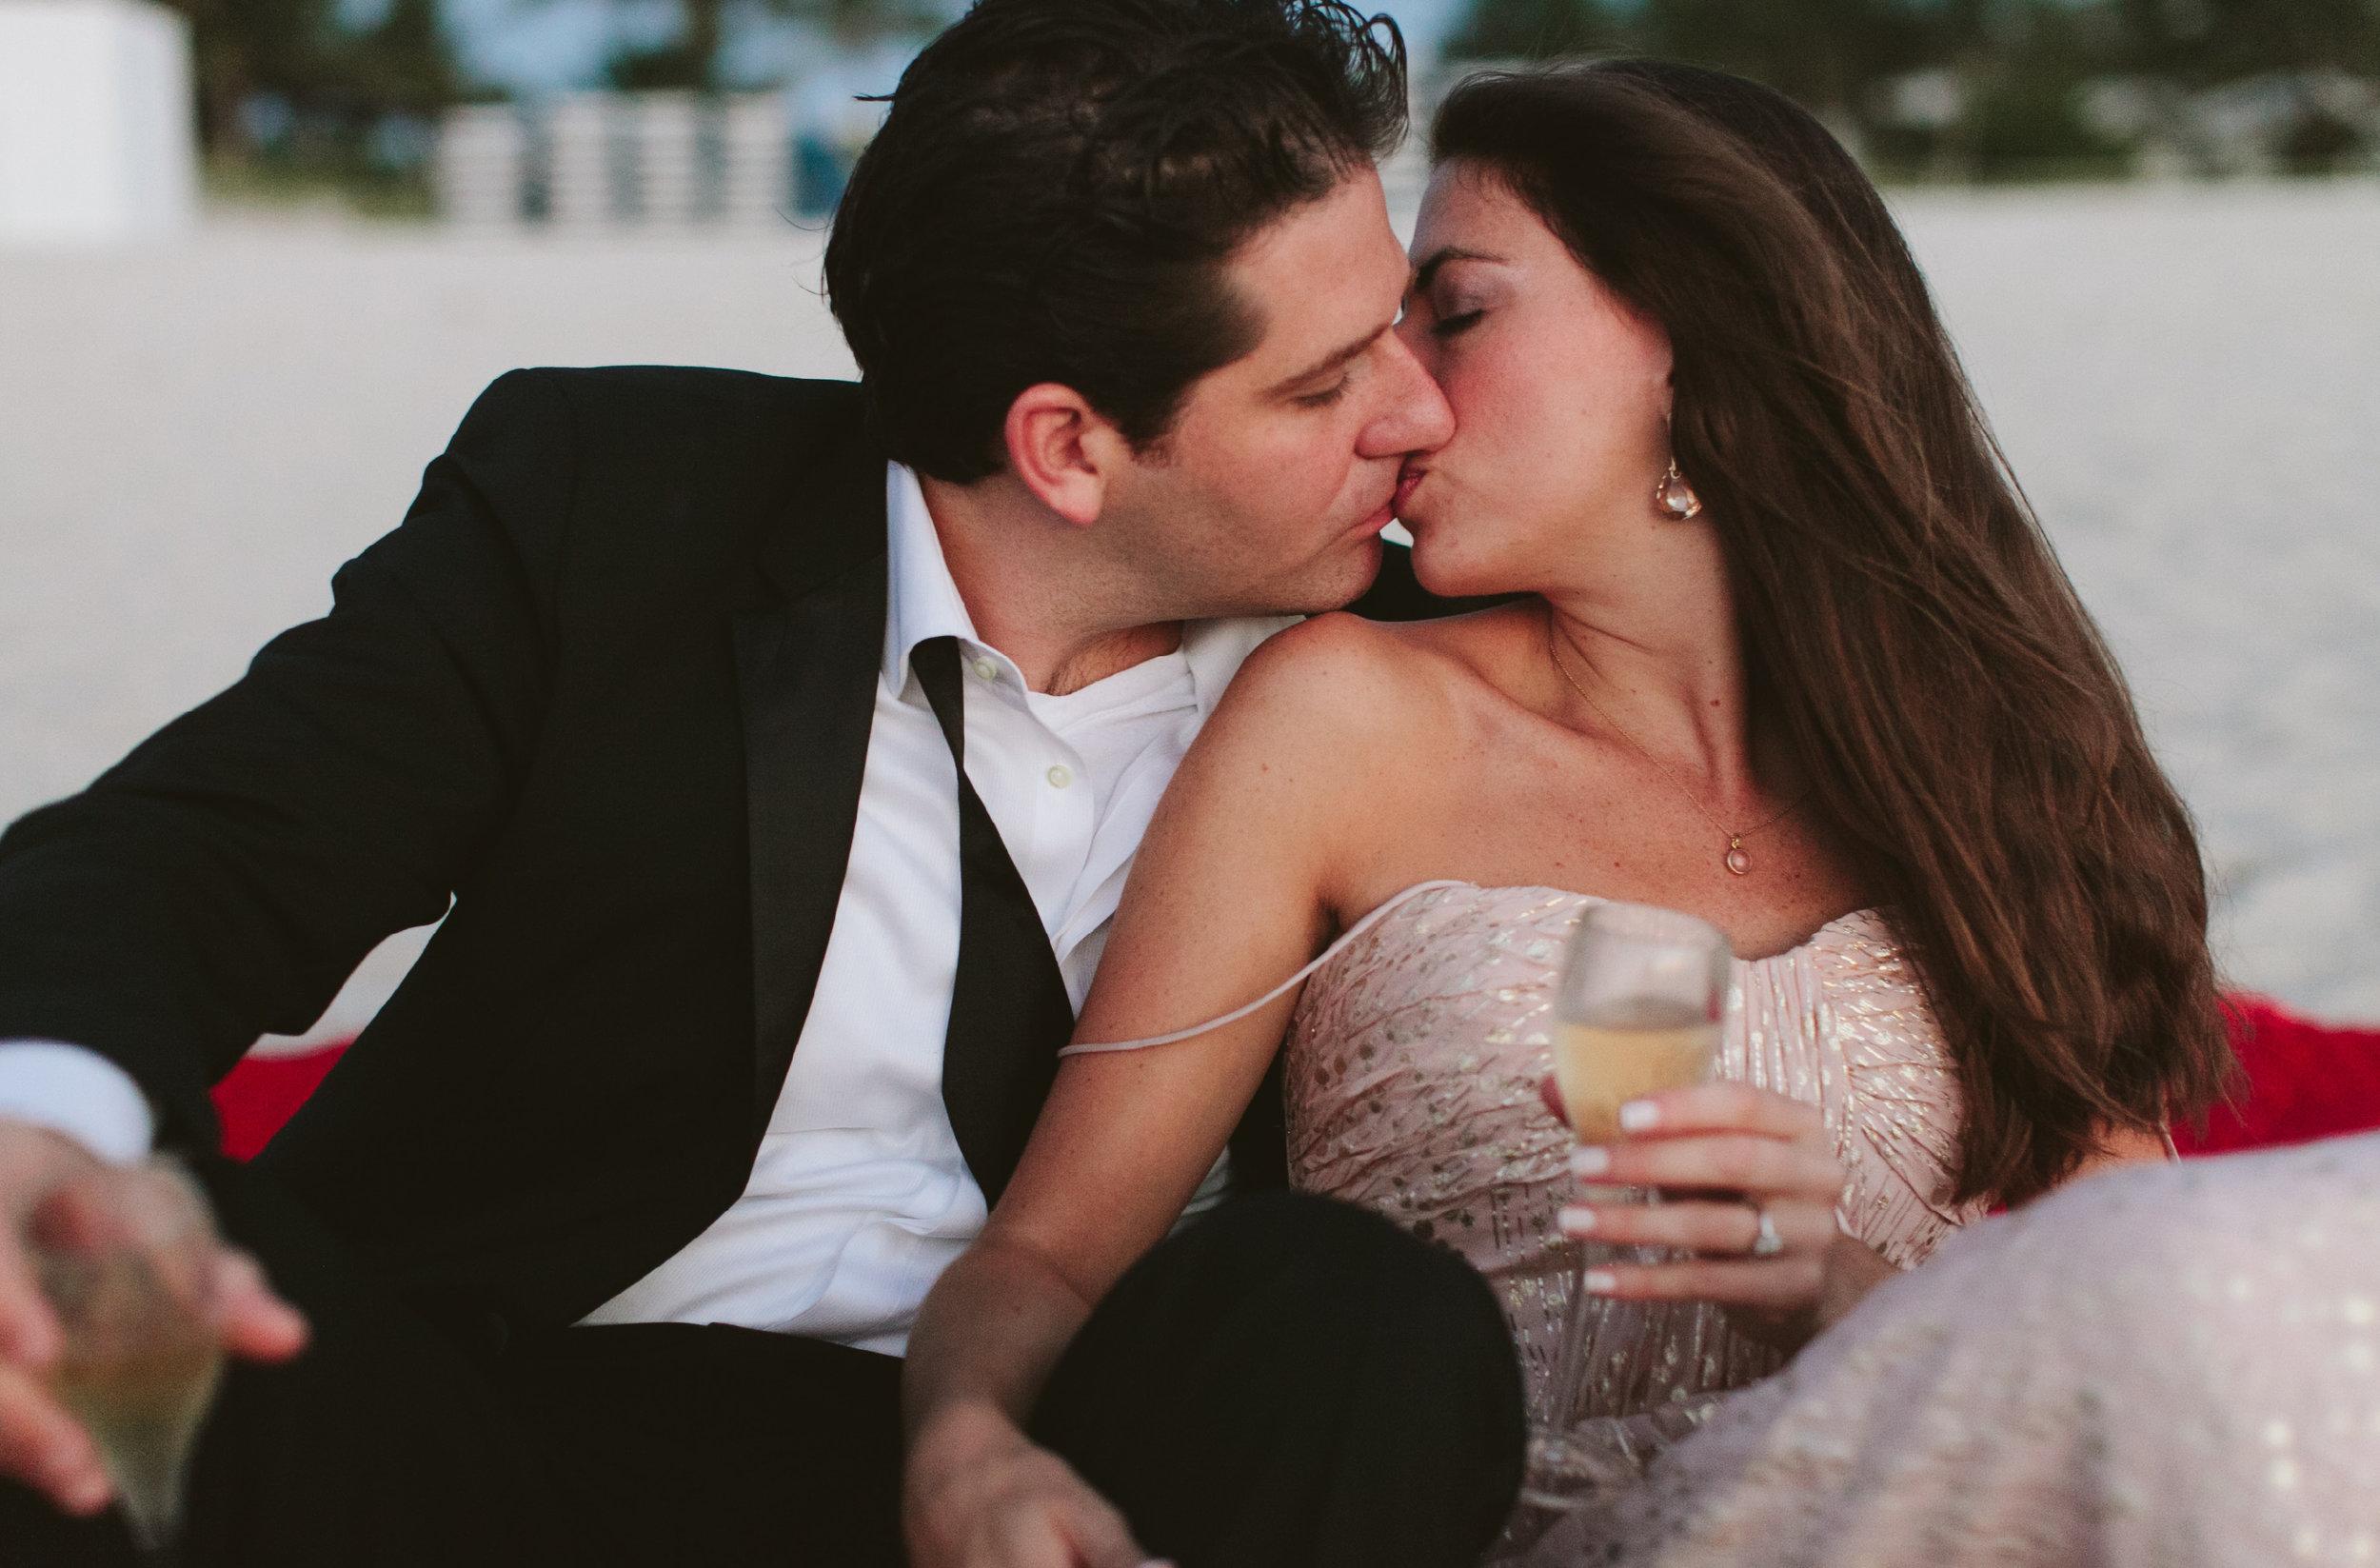 Meli + Mike South Pointe Park South Beach Miami Engagement Shoot11.jpg